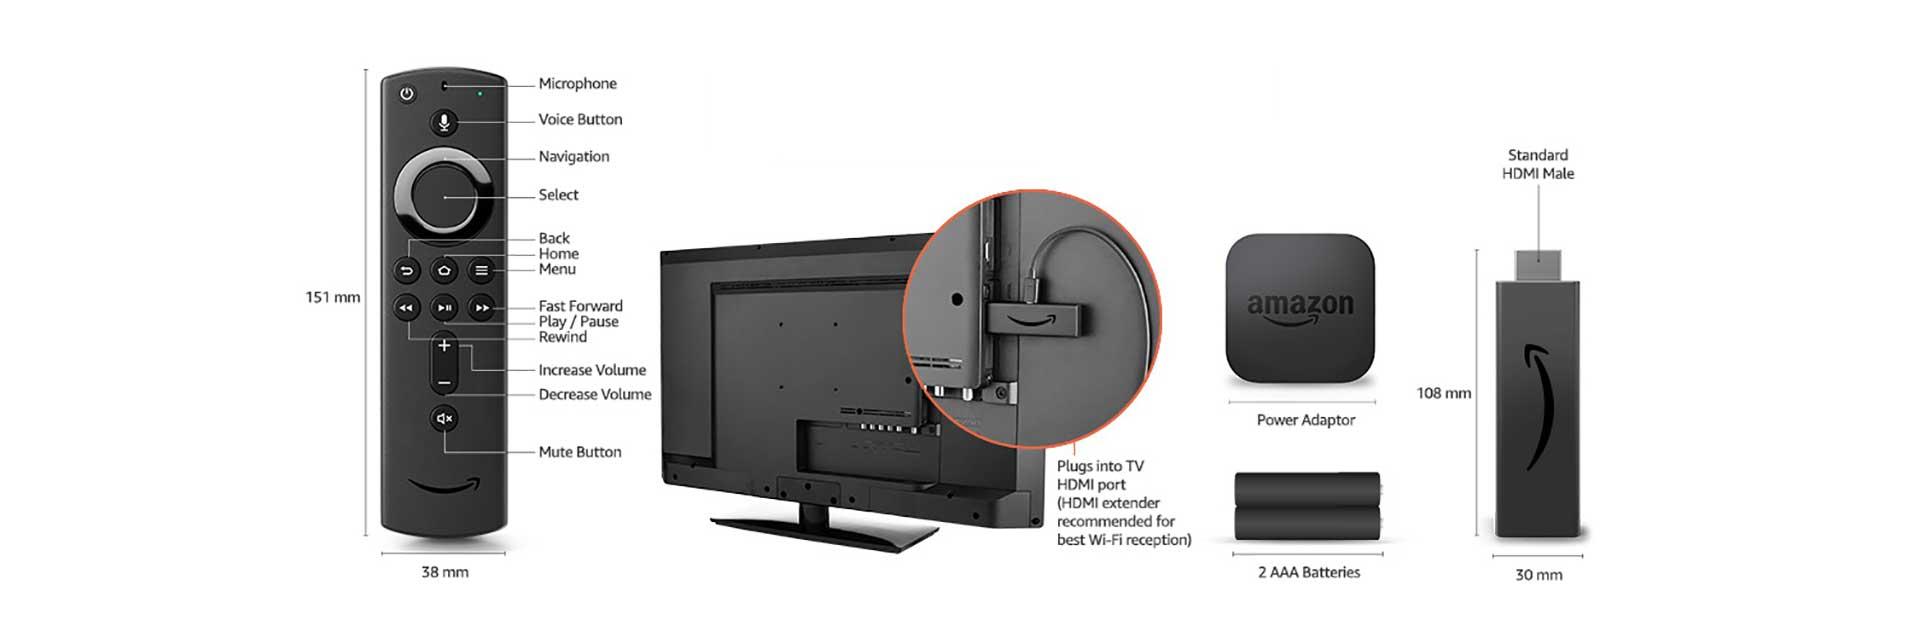 Схема подключения Amazon Fire Stick к телевизору